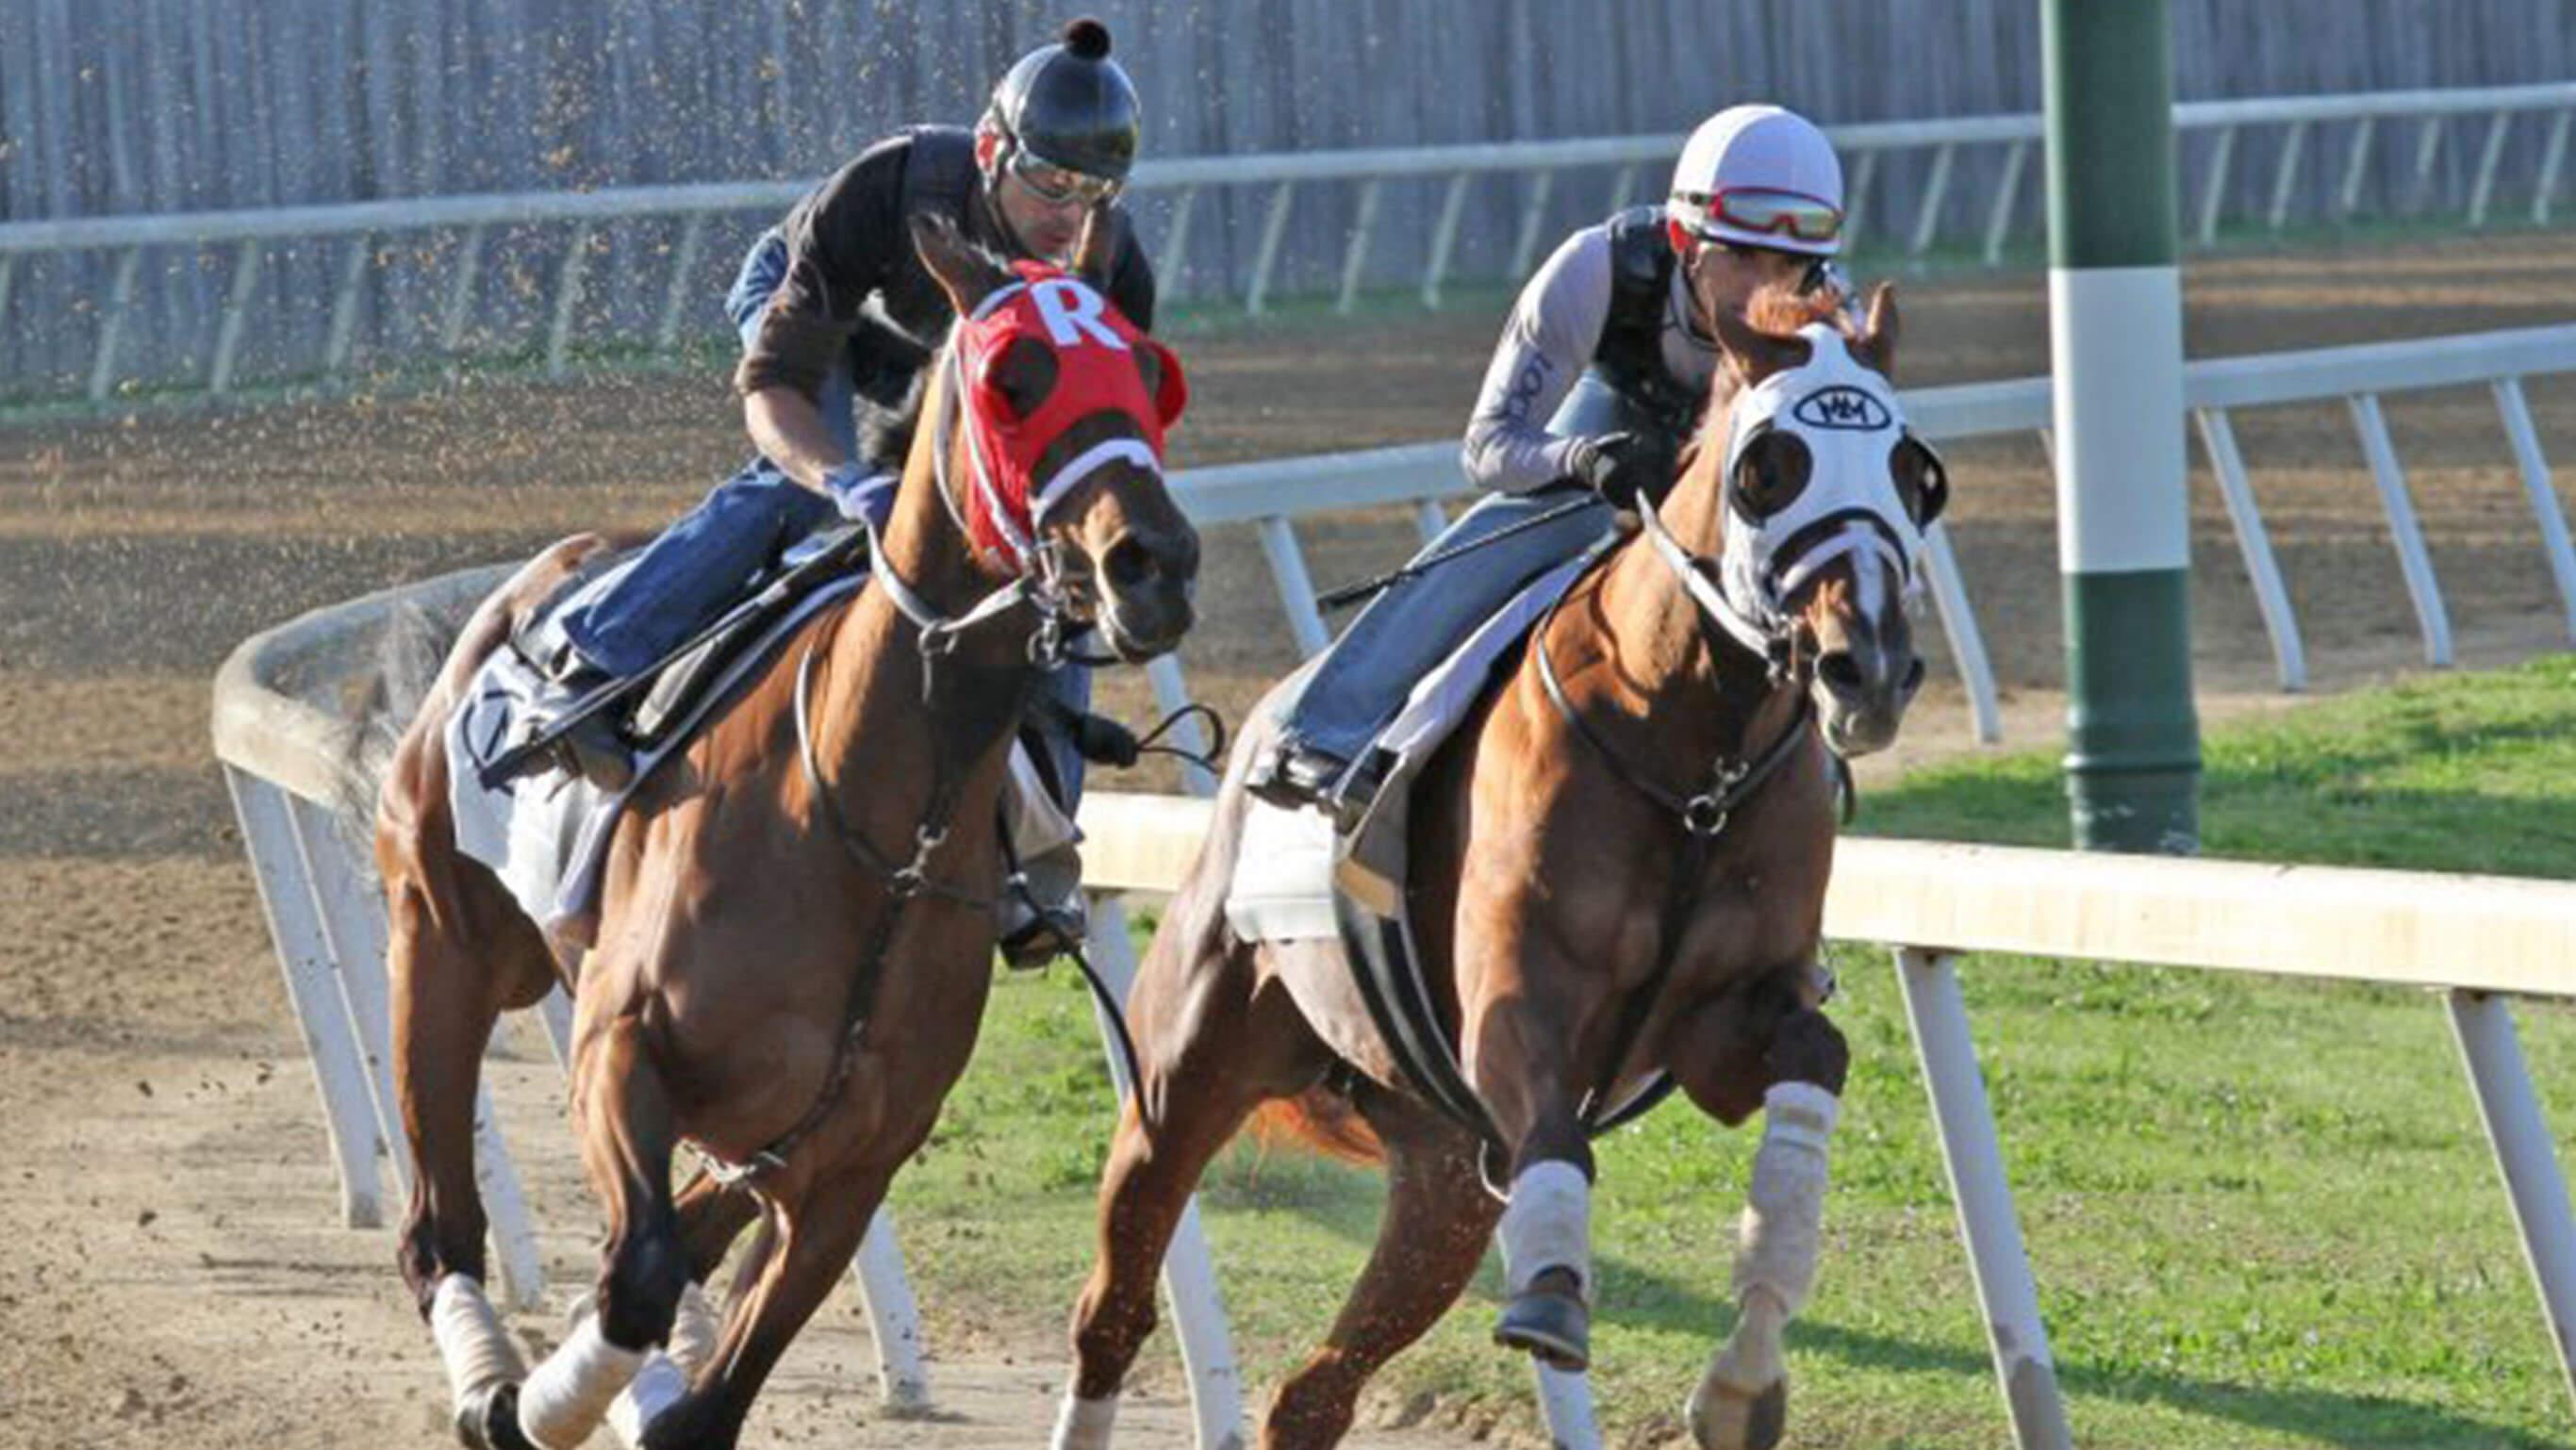 Two jockies racing horses